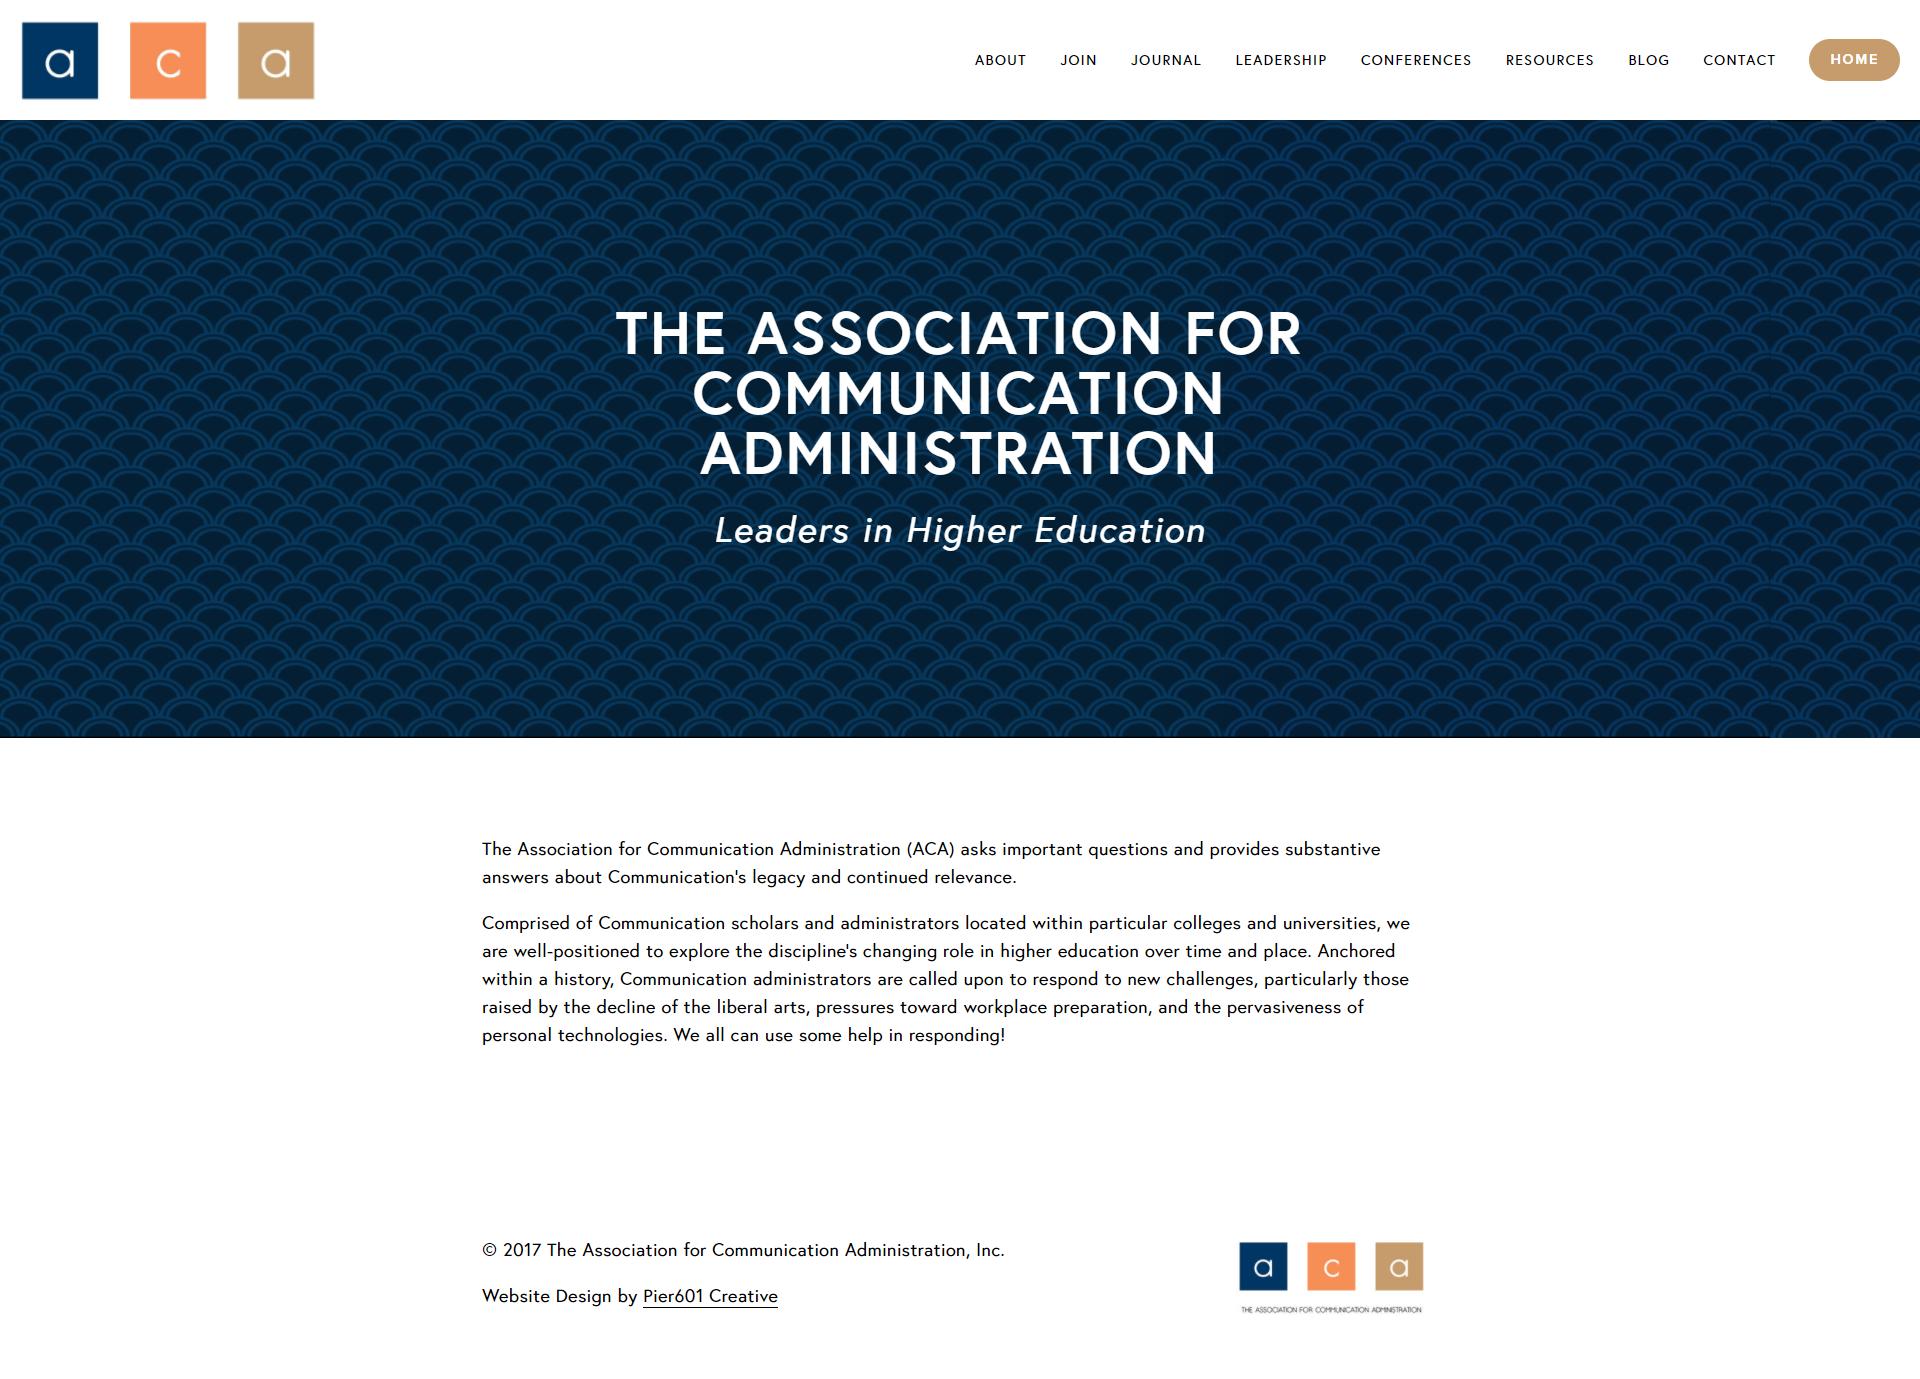 FireShot Capture 1 - Association for Communication Administration - https___commadministration.org_.png